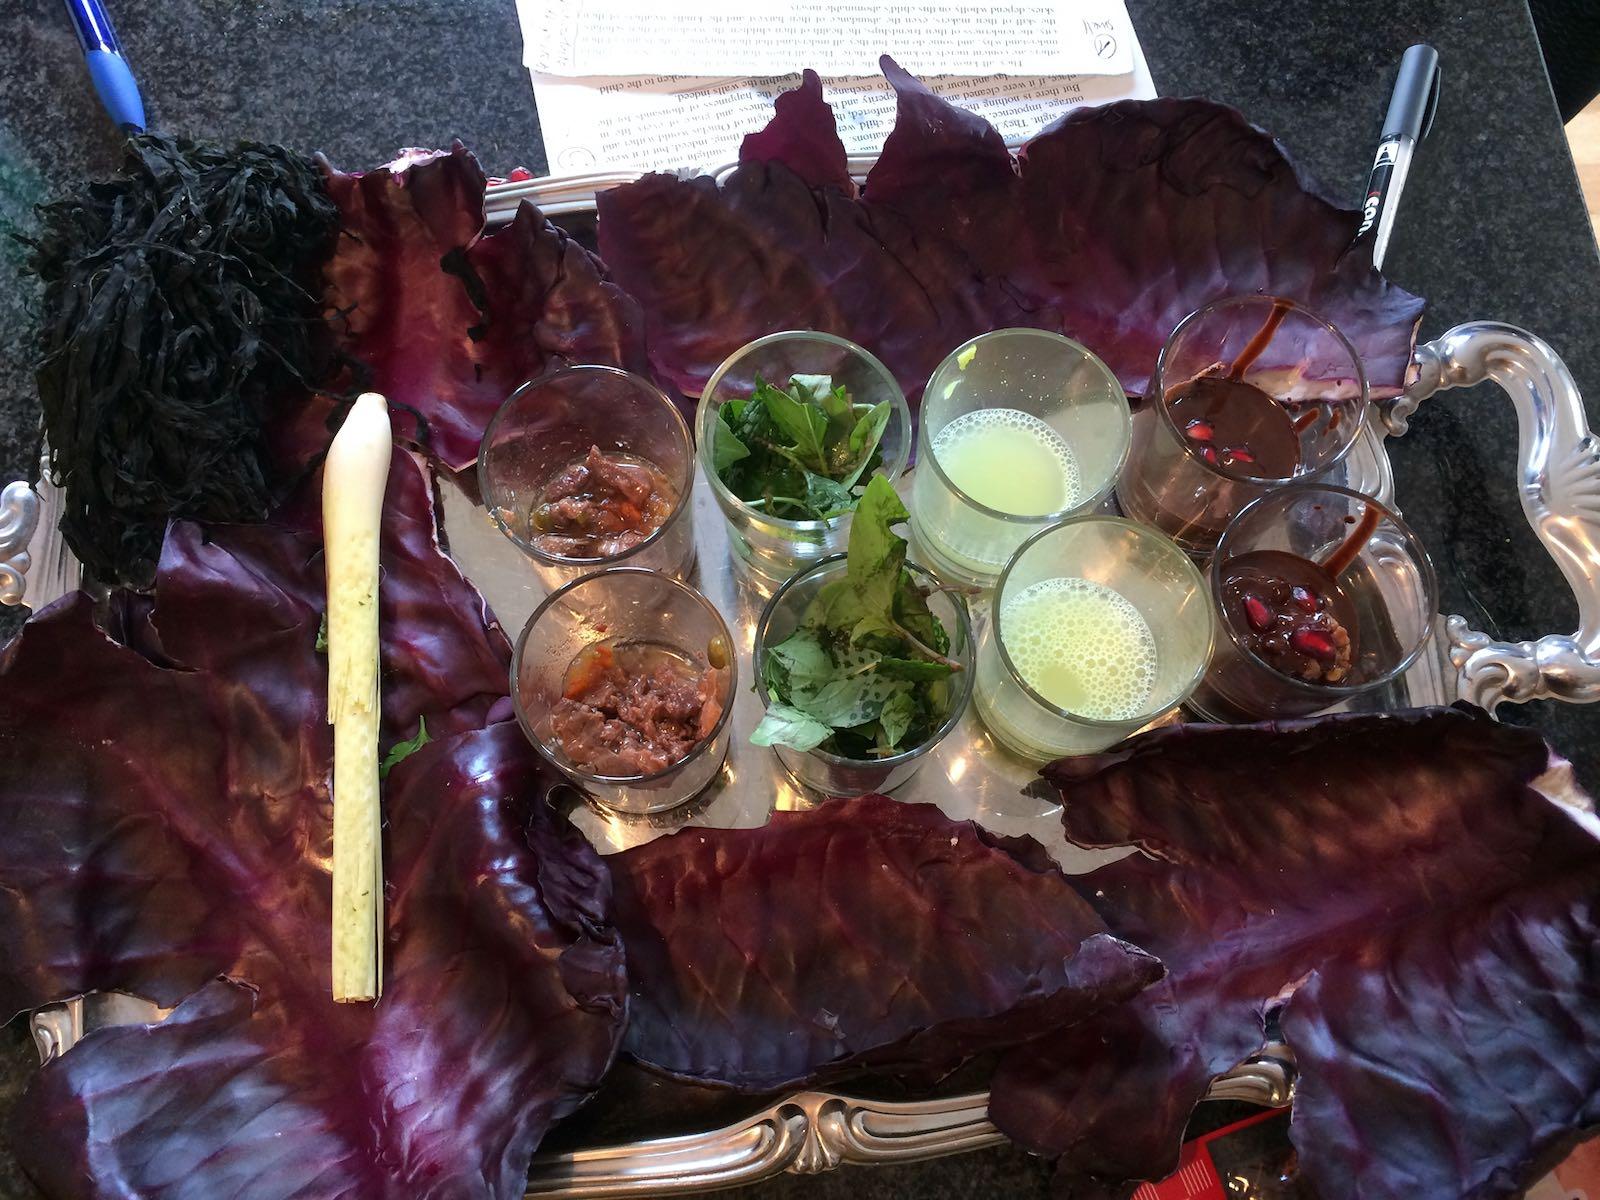 taste-smell-workshop-berlin-hughes-purcel